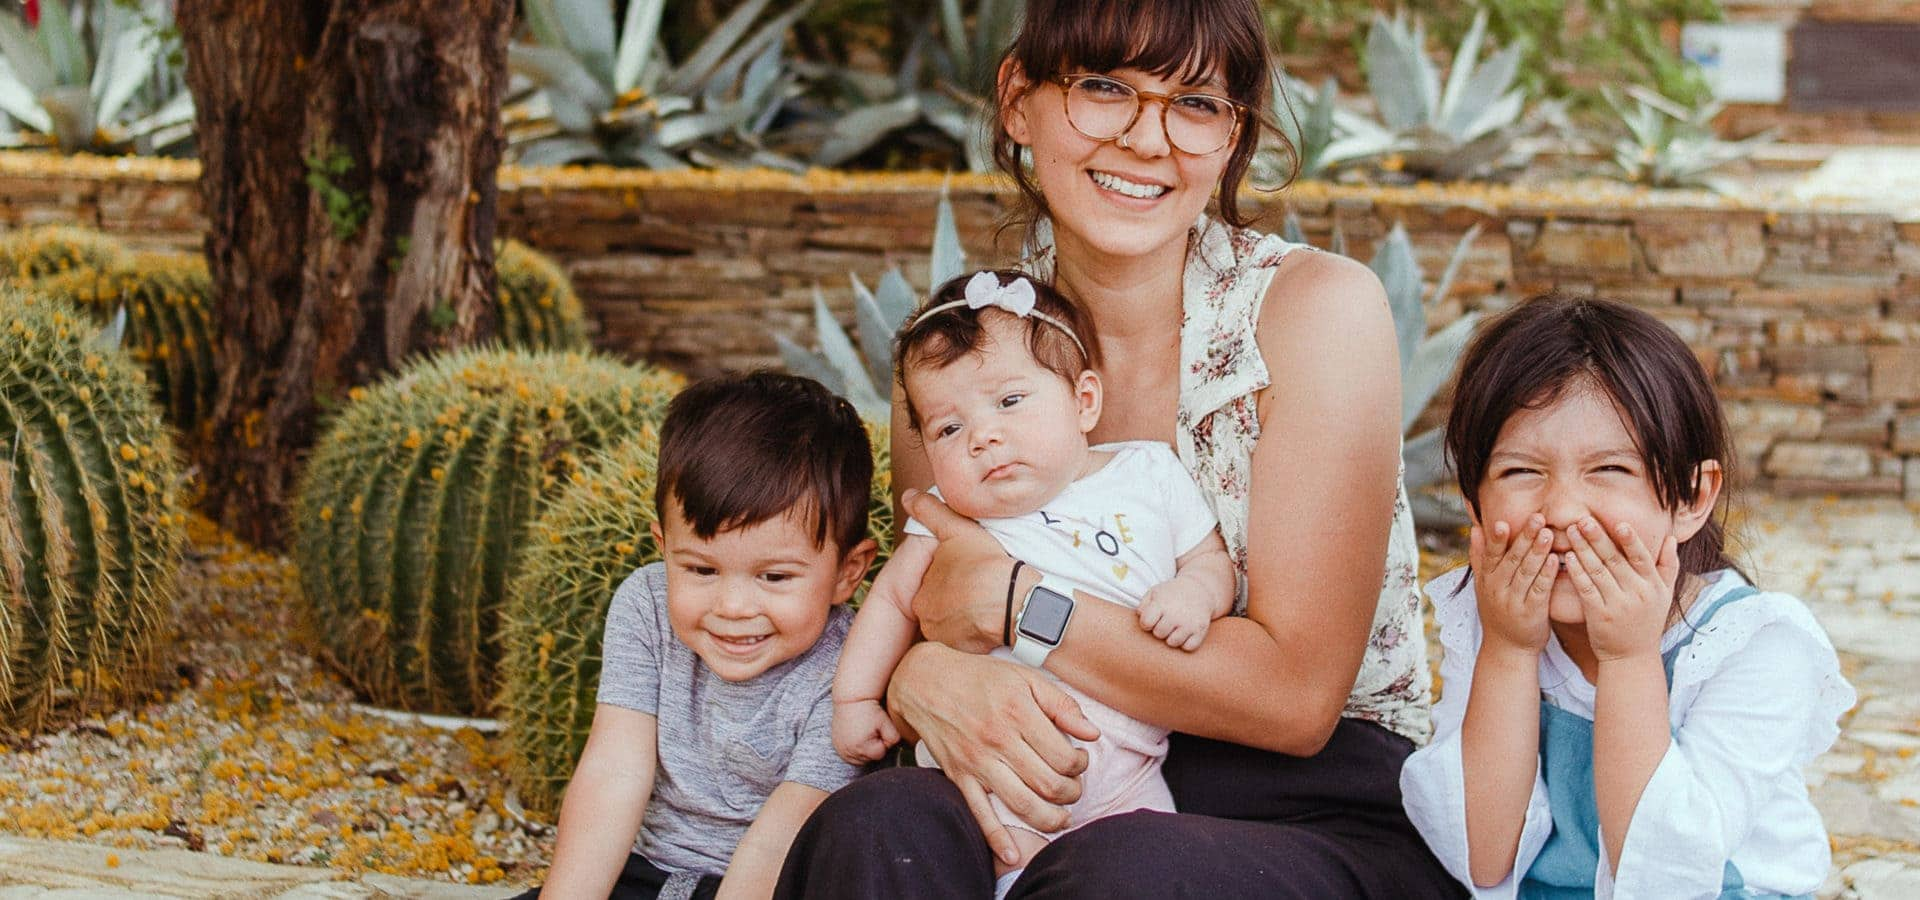 Nonprofit Brand Strategy for Desert Botanical Garden; Chicana mom and three children